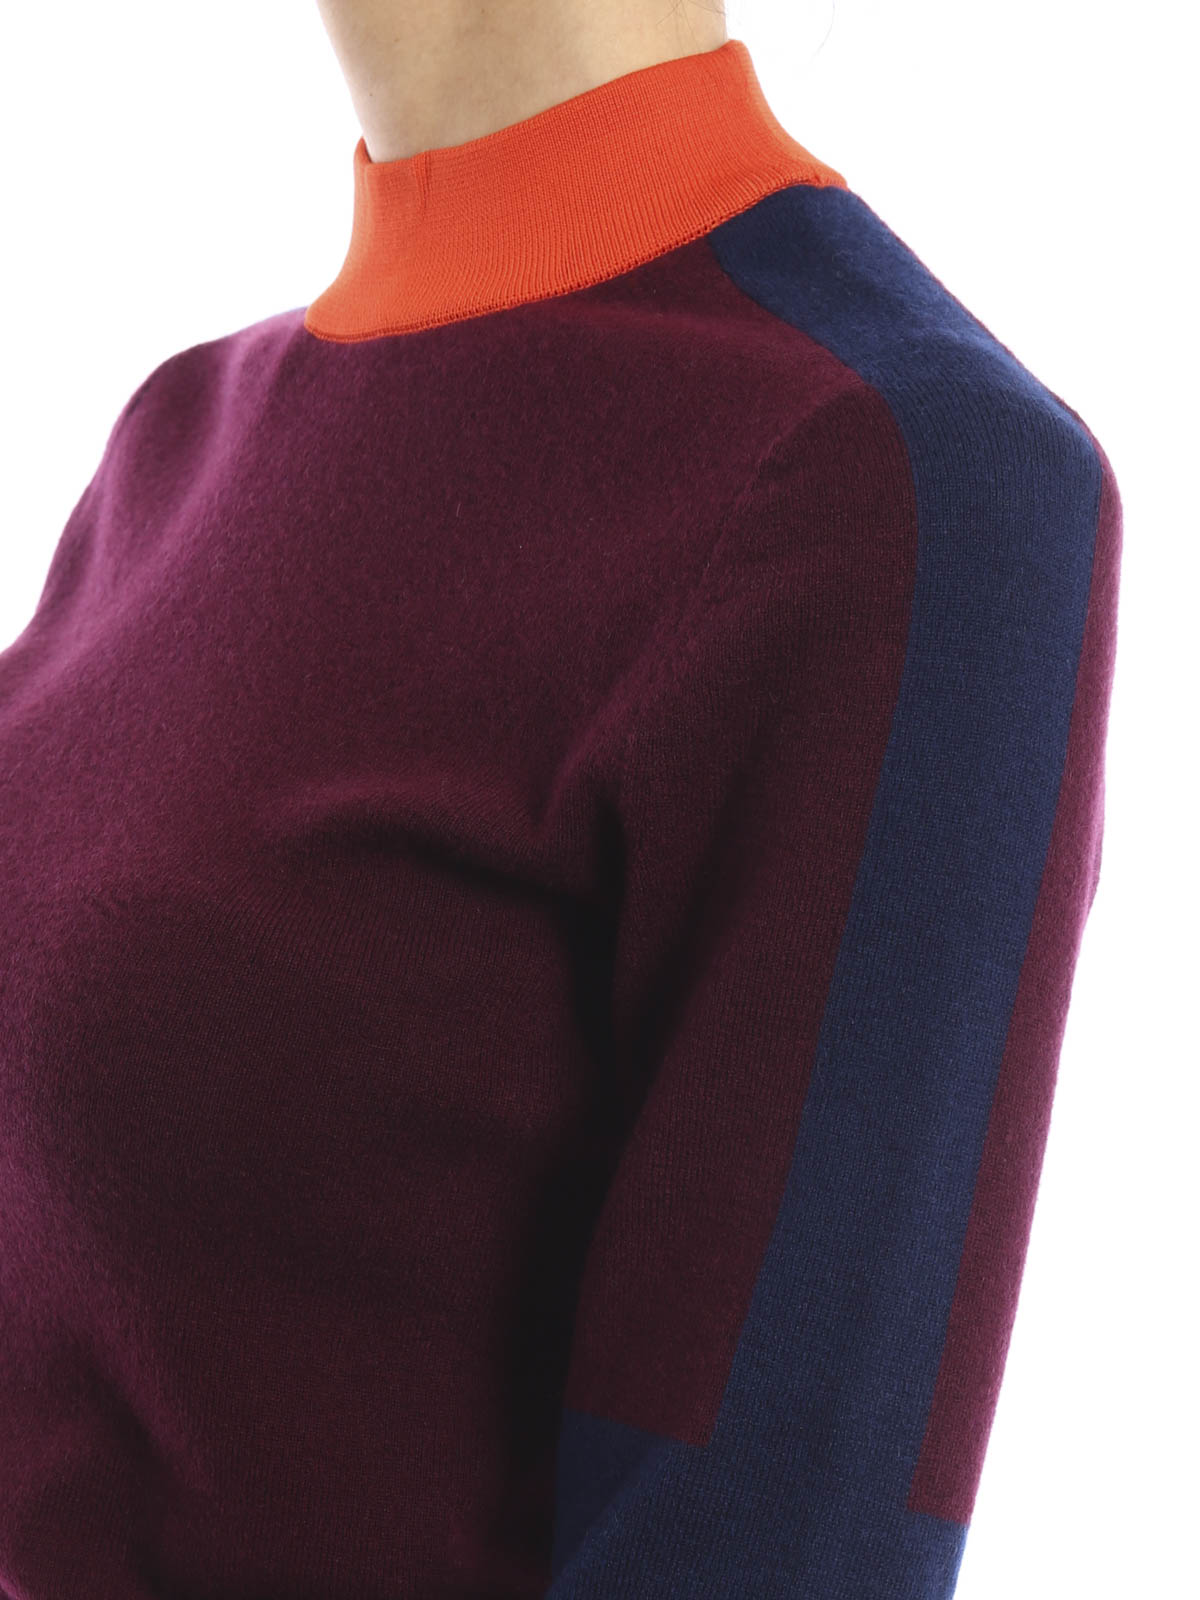 Megan cashmere sweater by Tory Burch - Turtlenecks & Polo necks ...